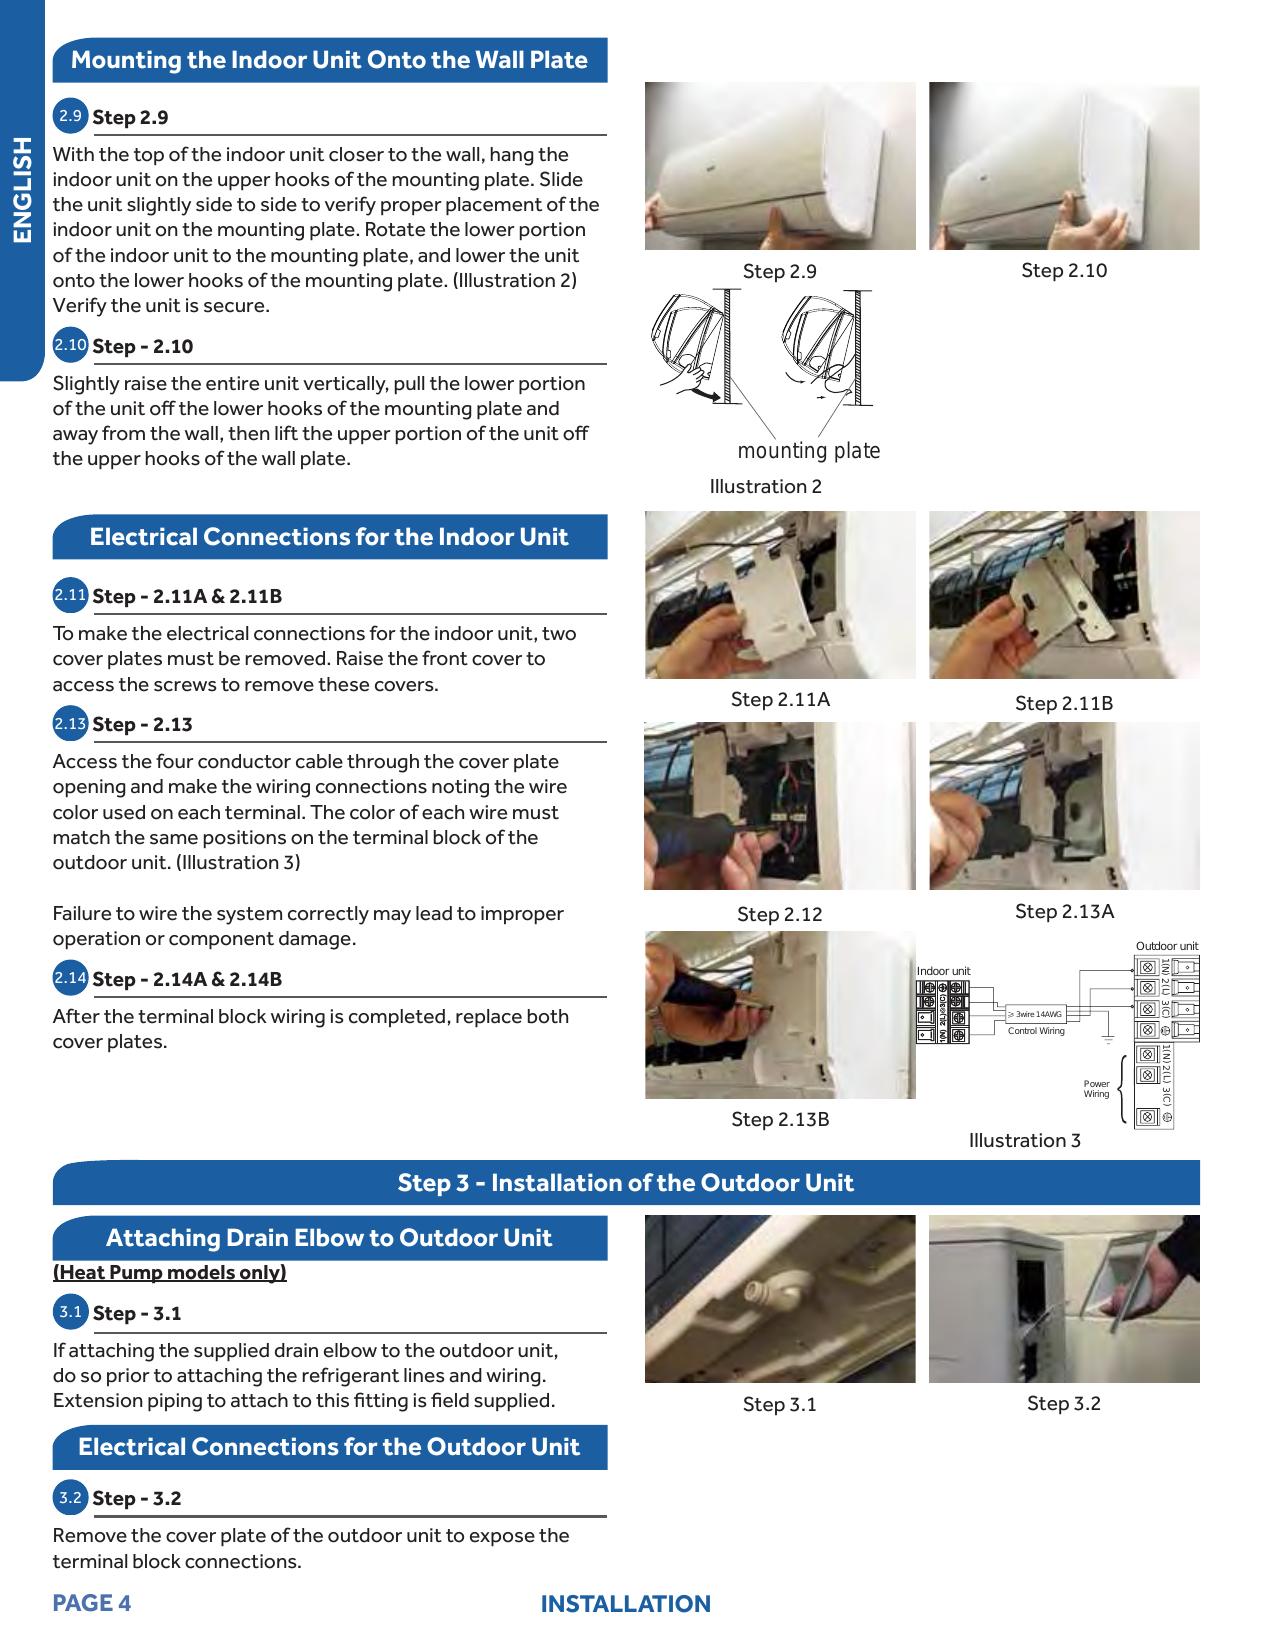 Haier Aw09eh2vha User Manual Air Handler Indoor Blowerevap Wiring Diagrams Page 4 Of 10